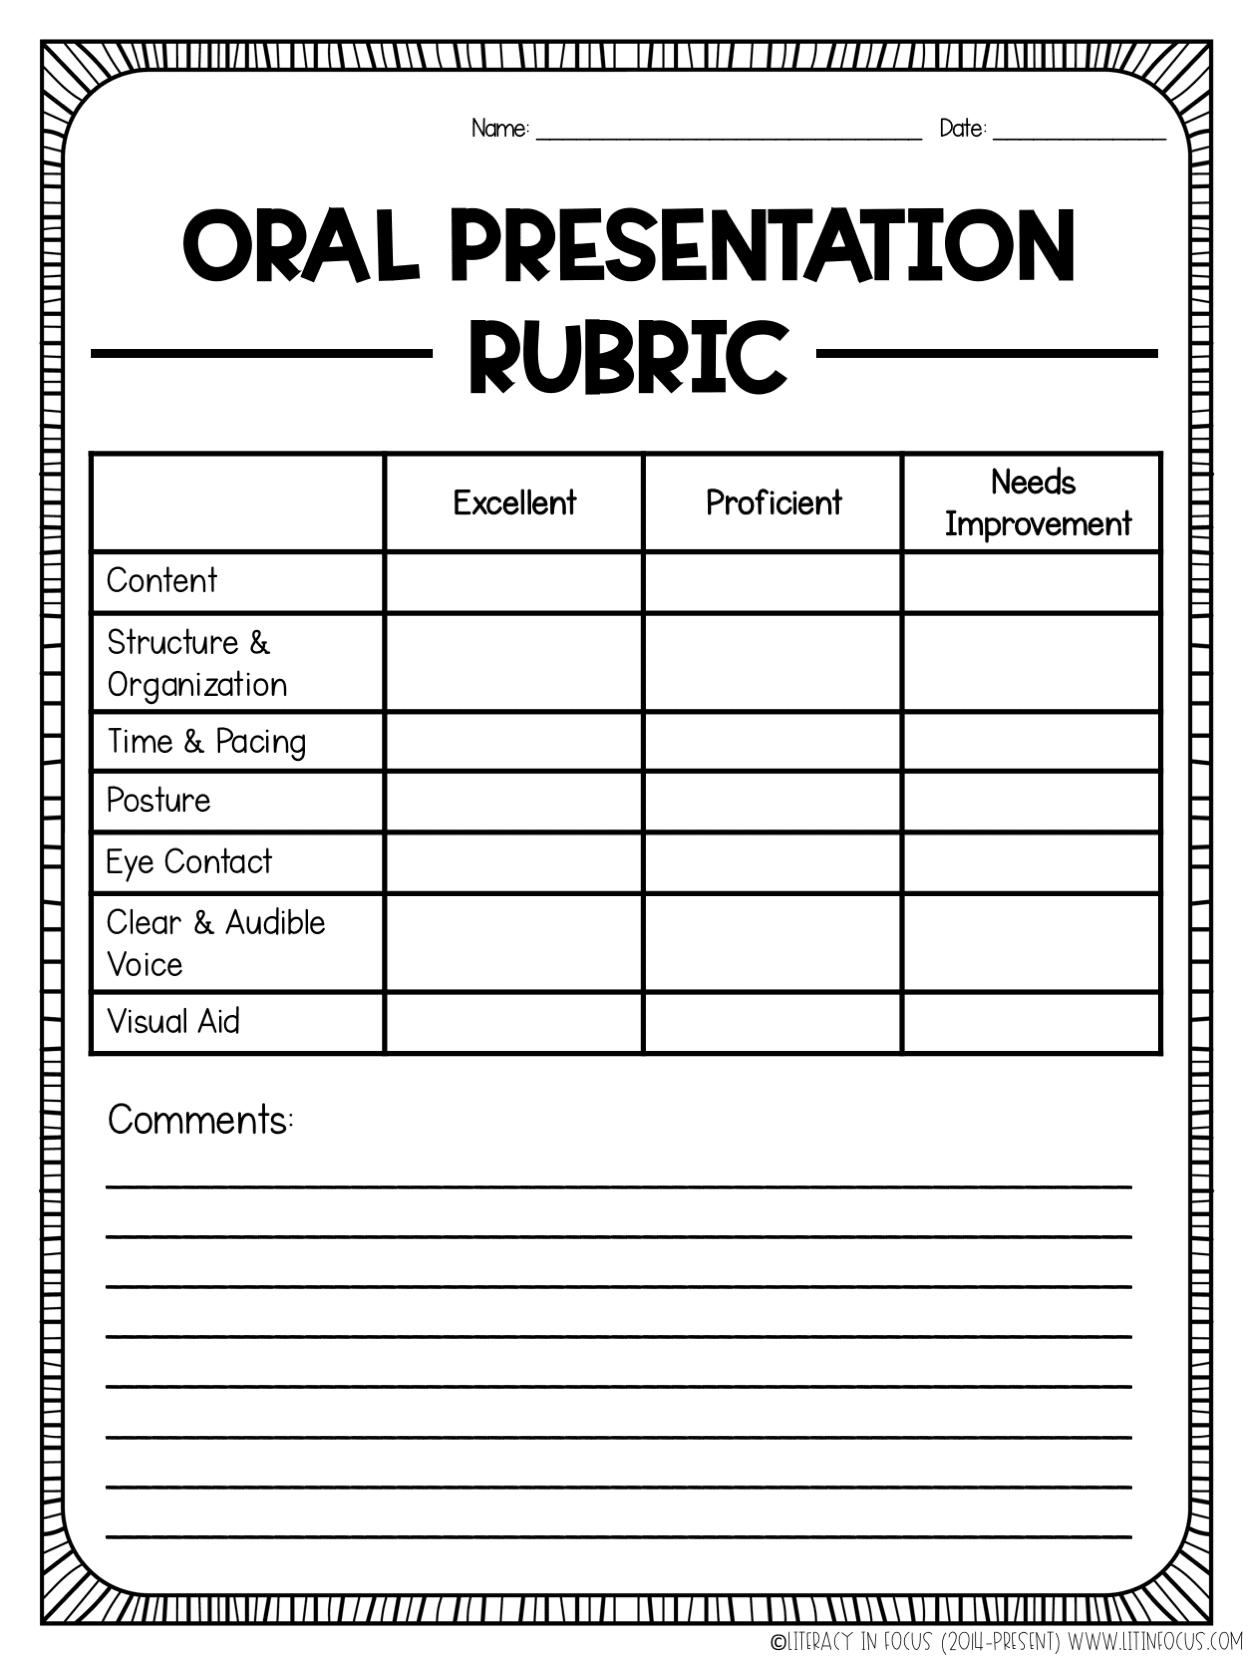 Preparing Students For Successful Presentations